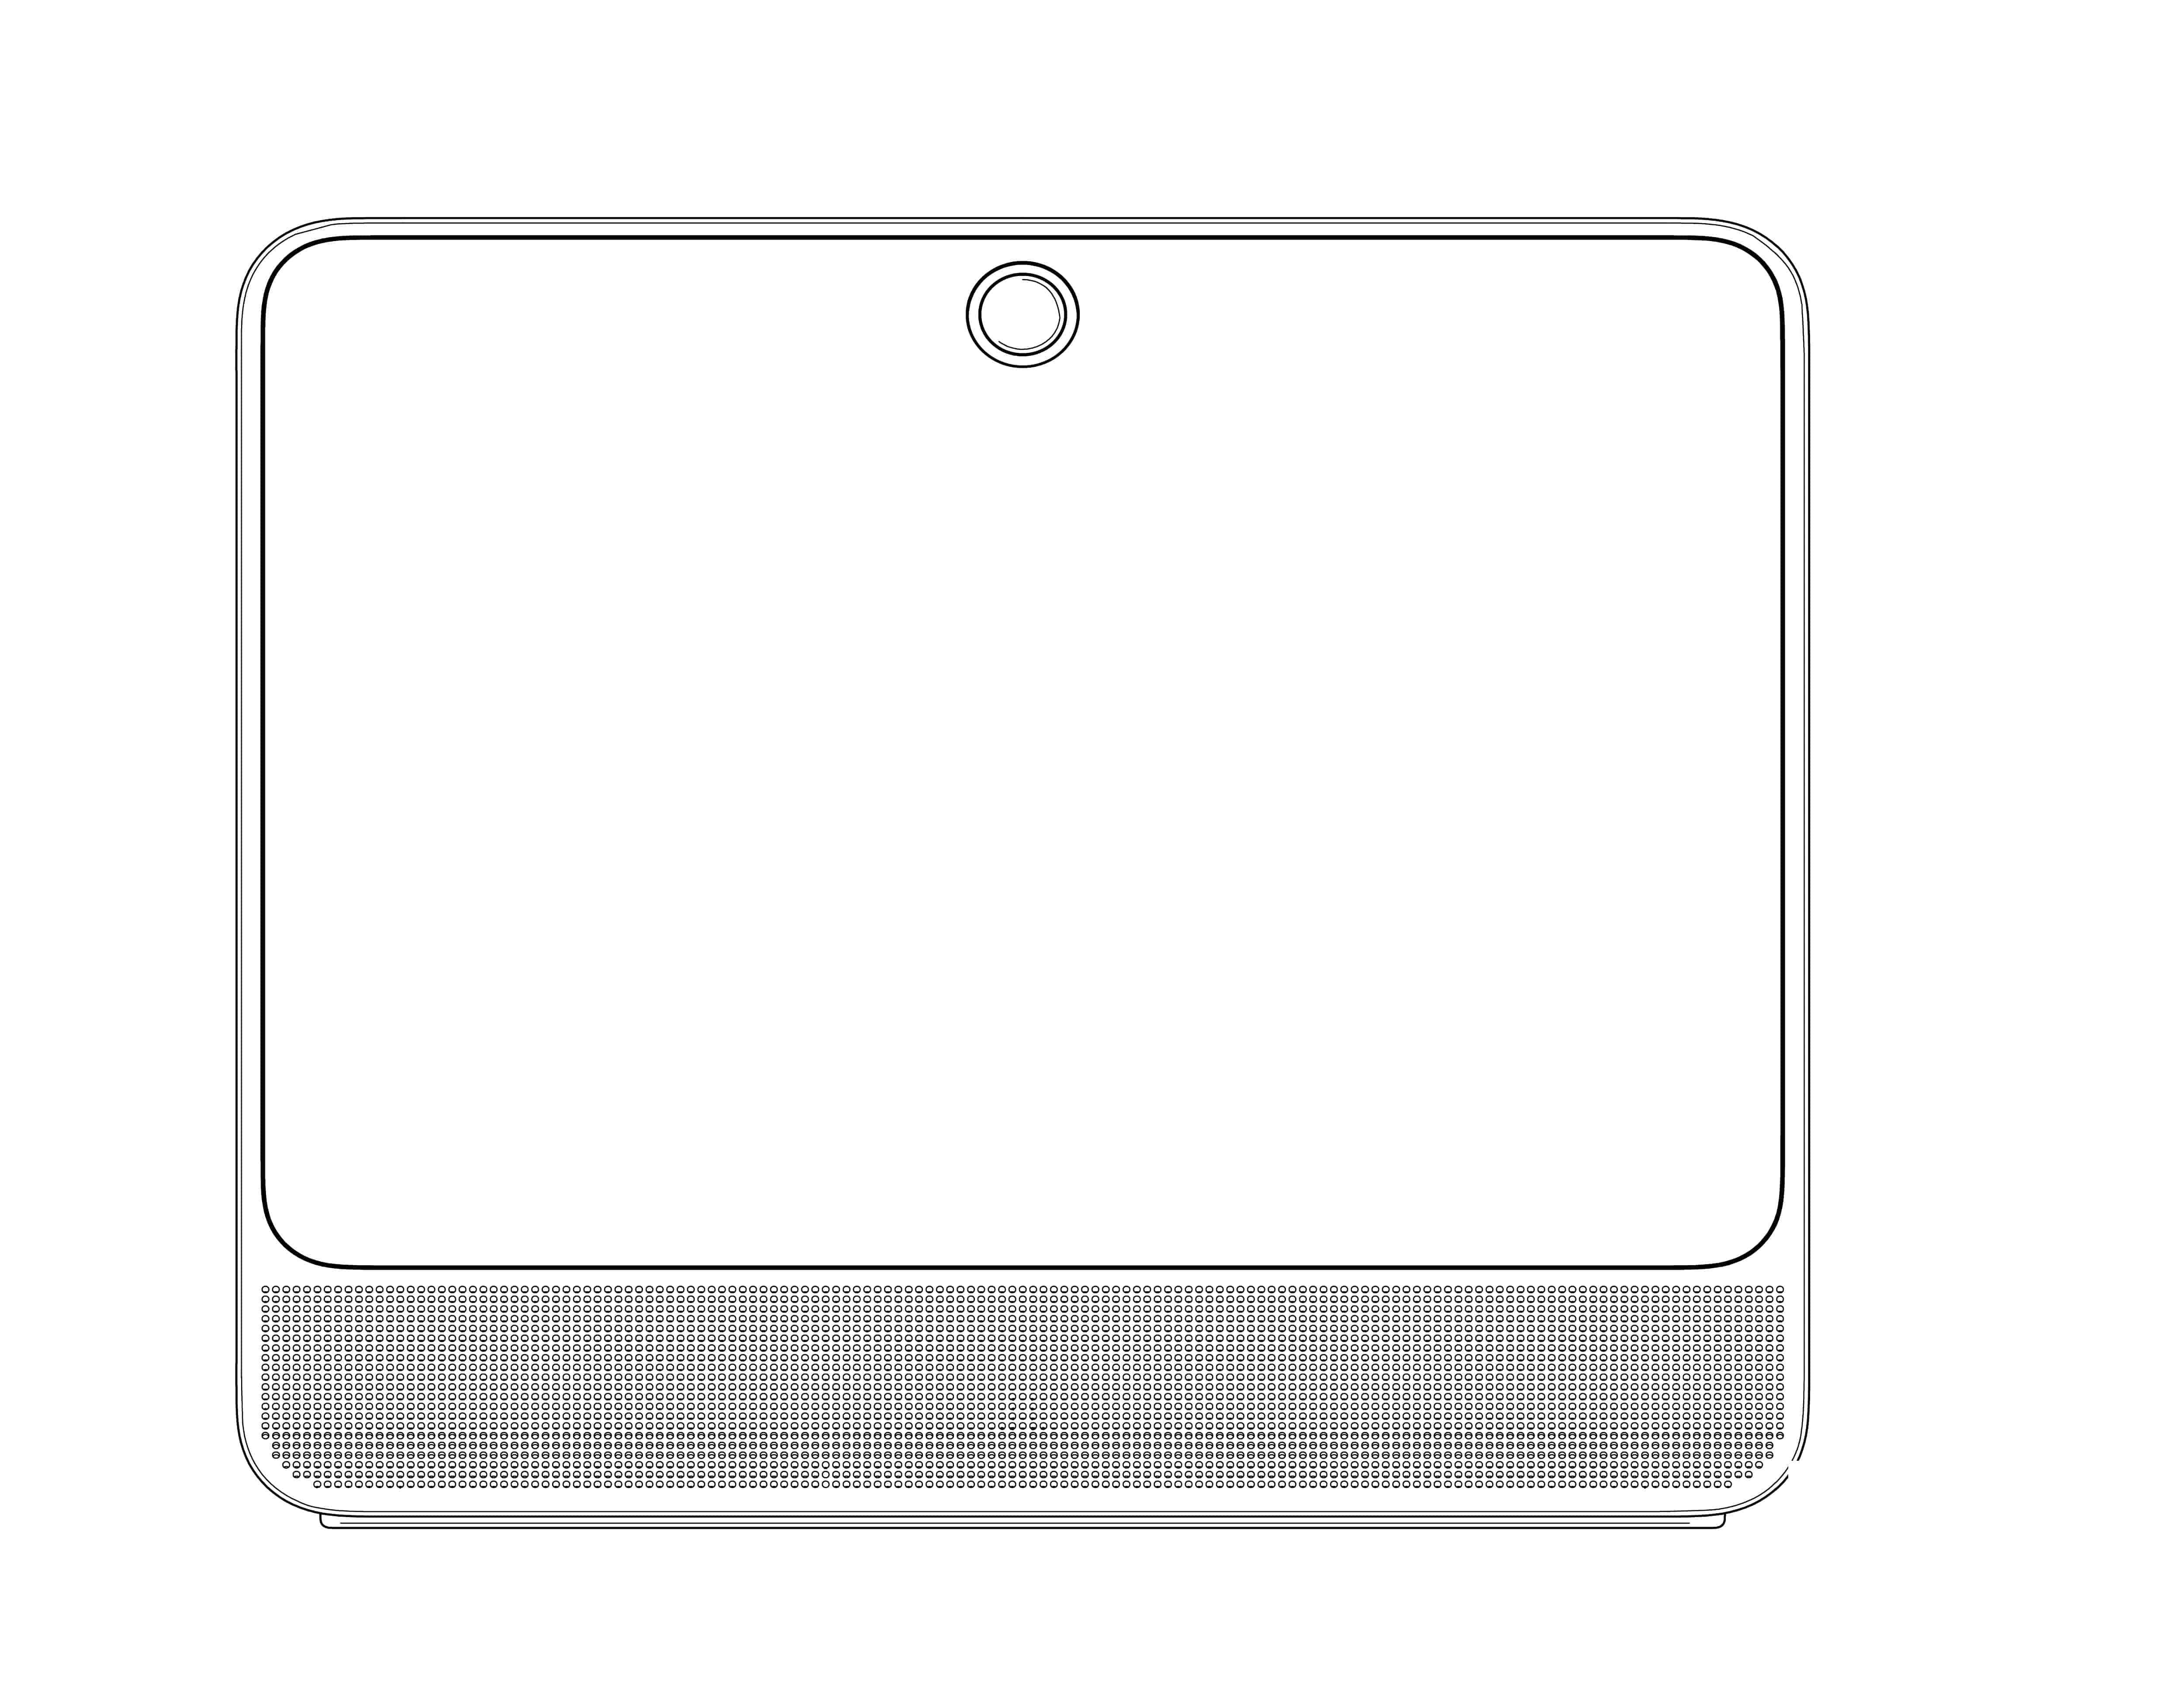 Facebook Smart Speaker 3